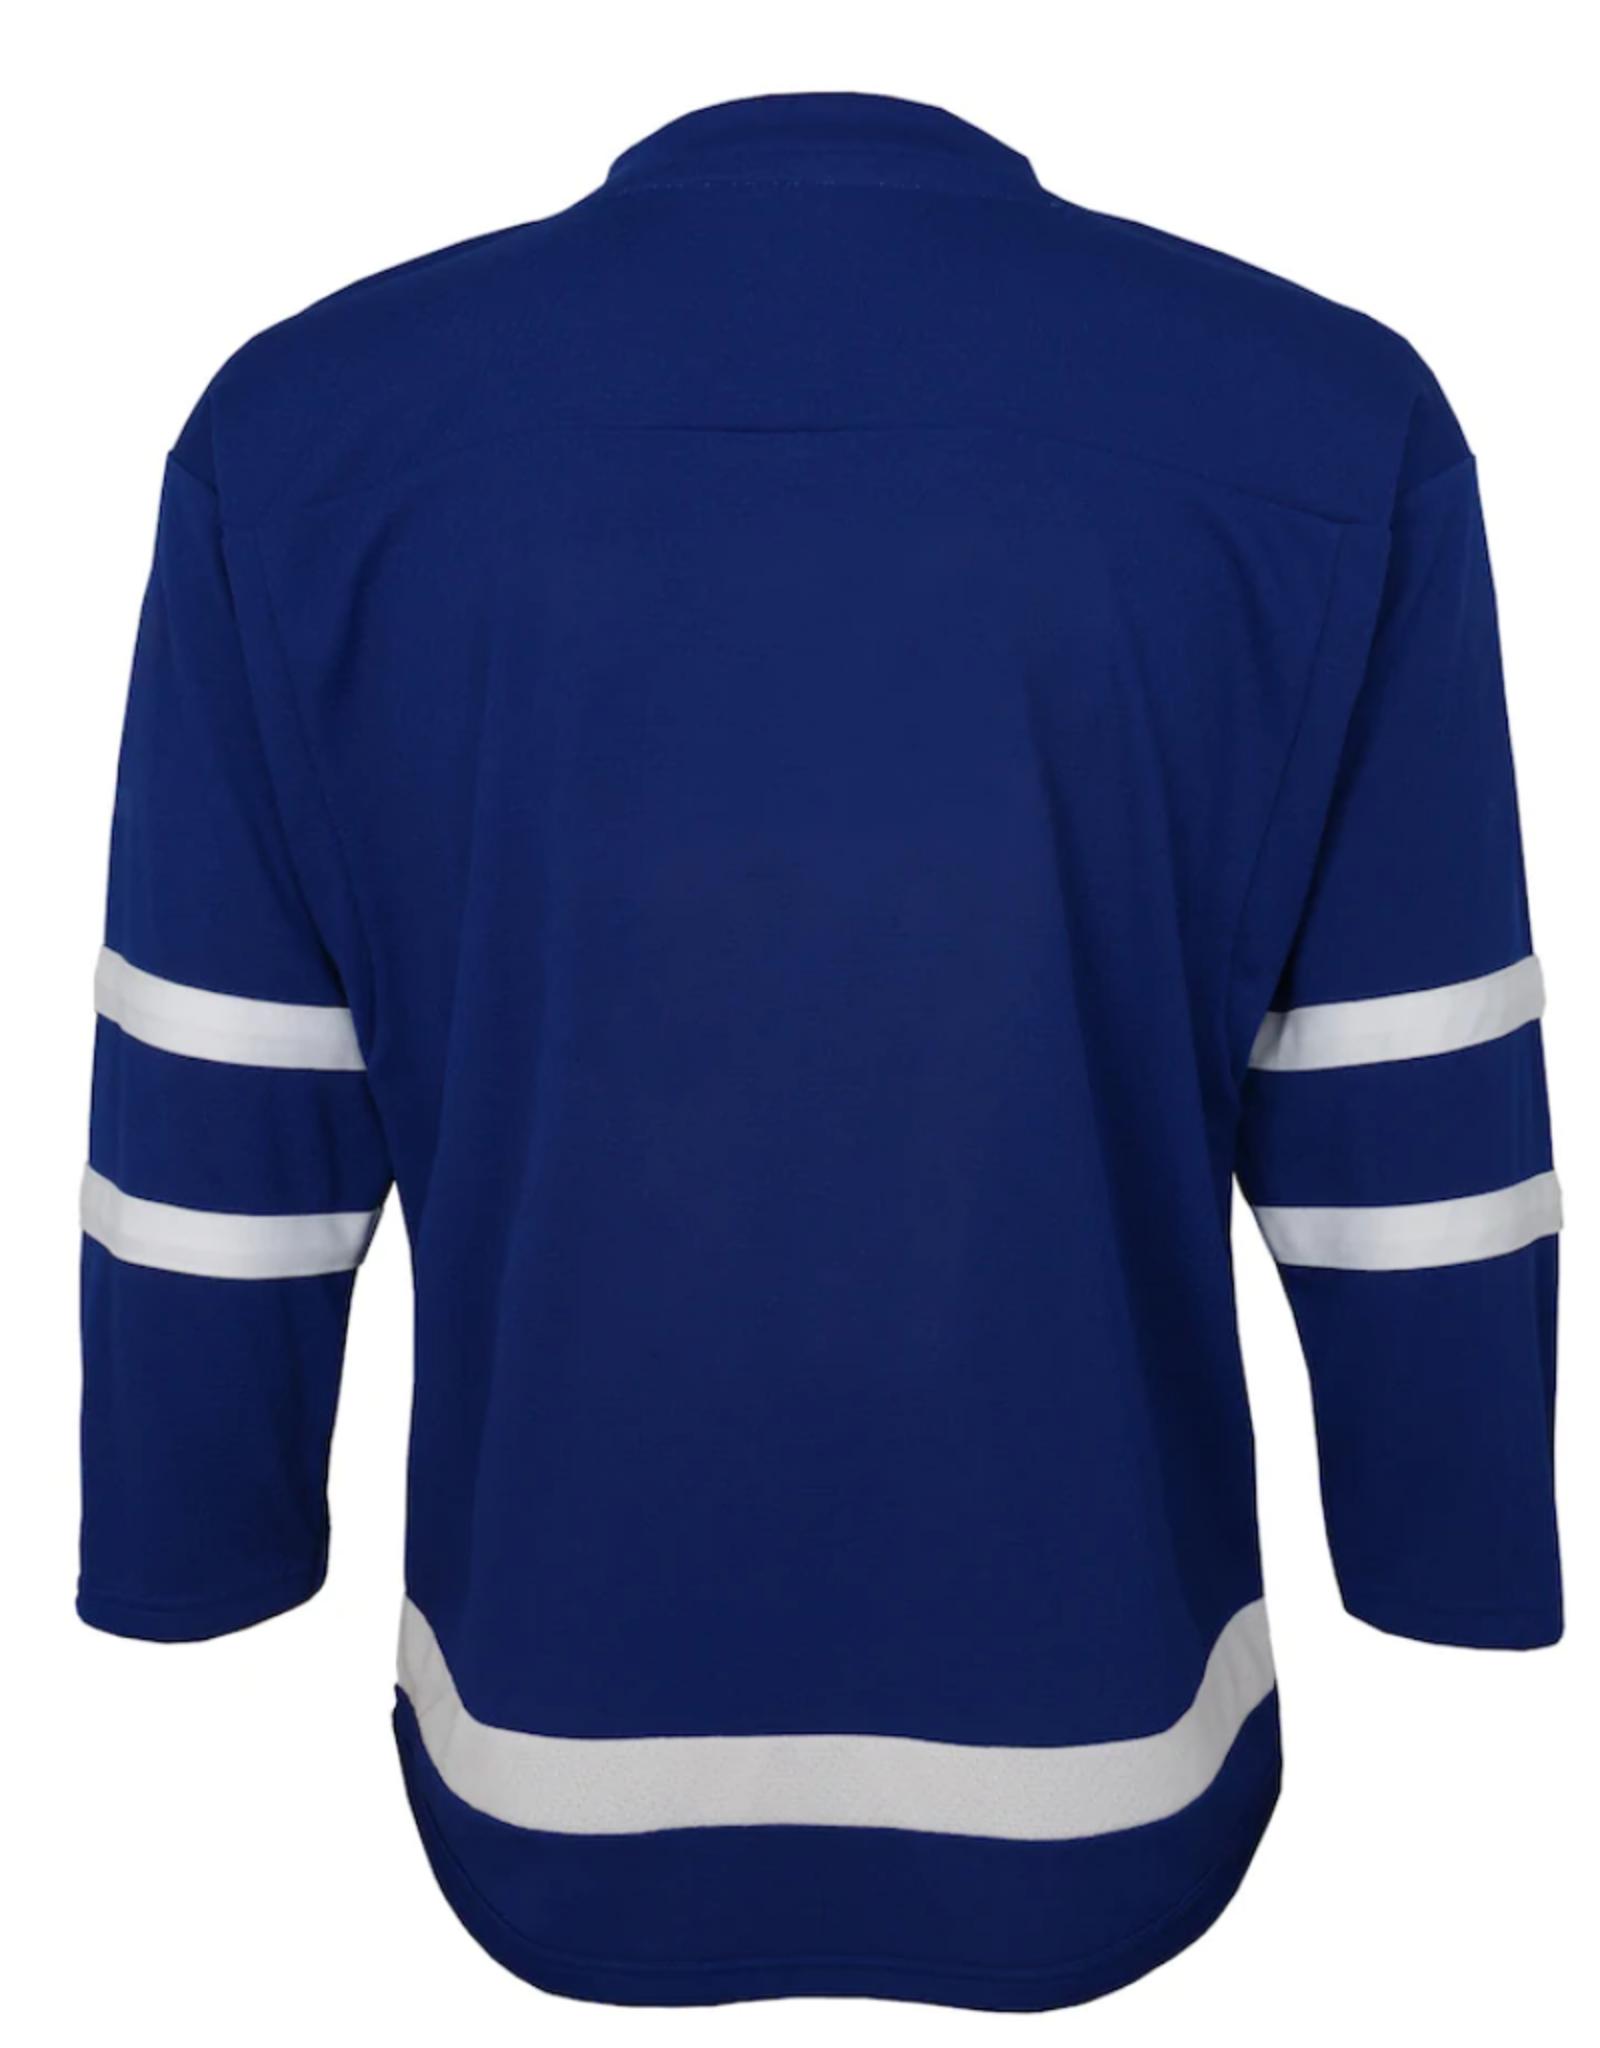 NHL Child Replica Home Jersey Toronto Maple Leafs 4/7 Blue